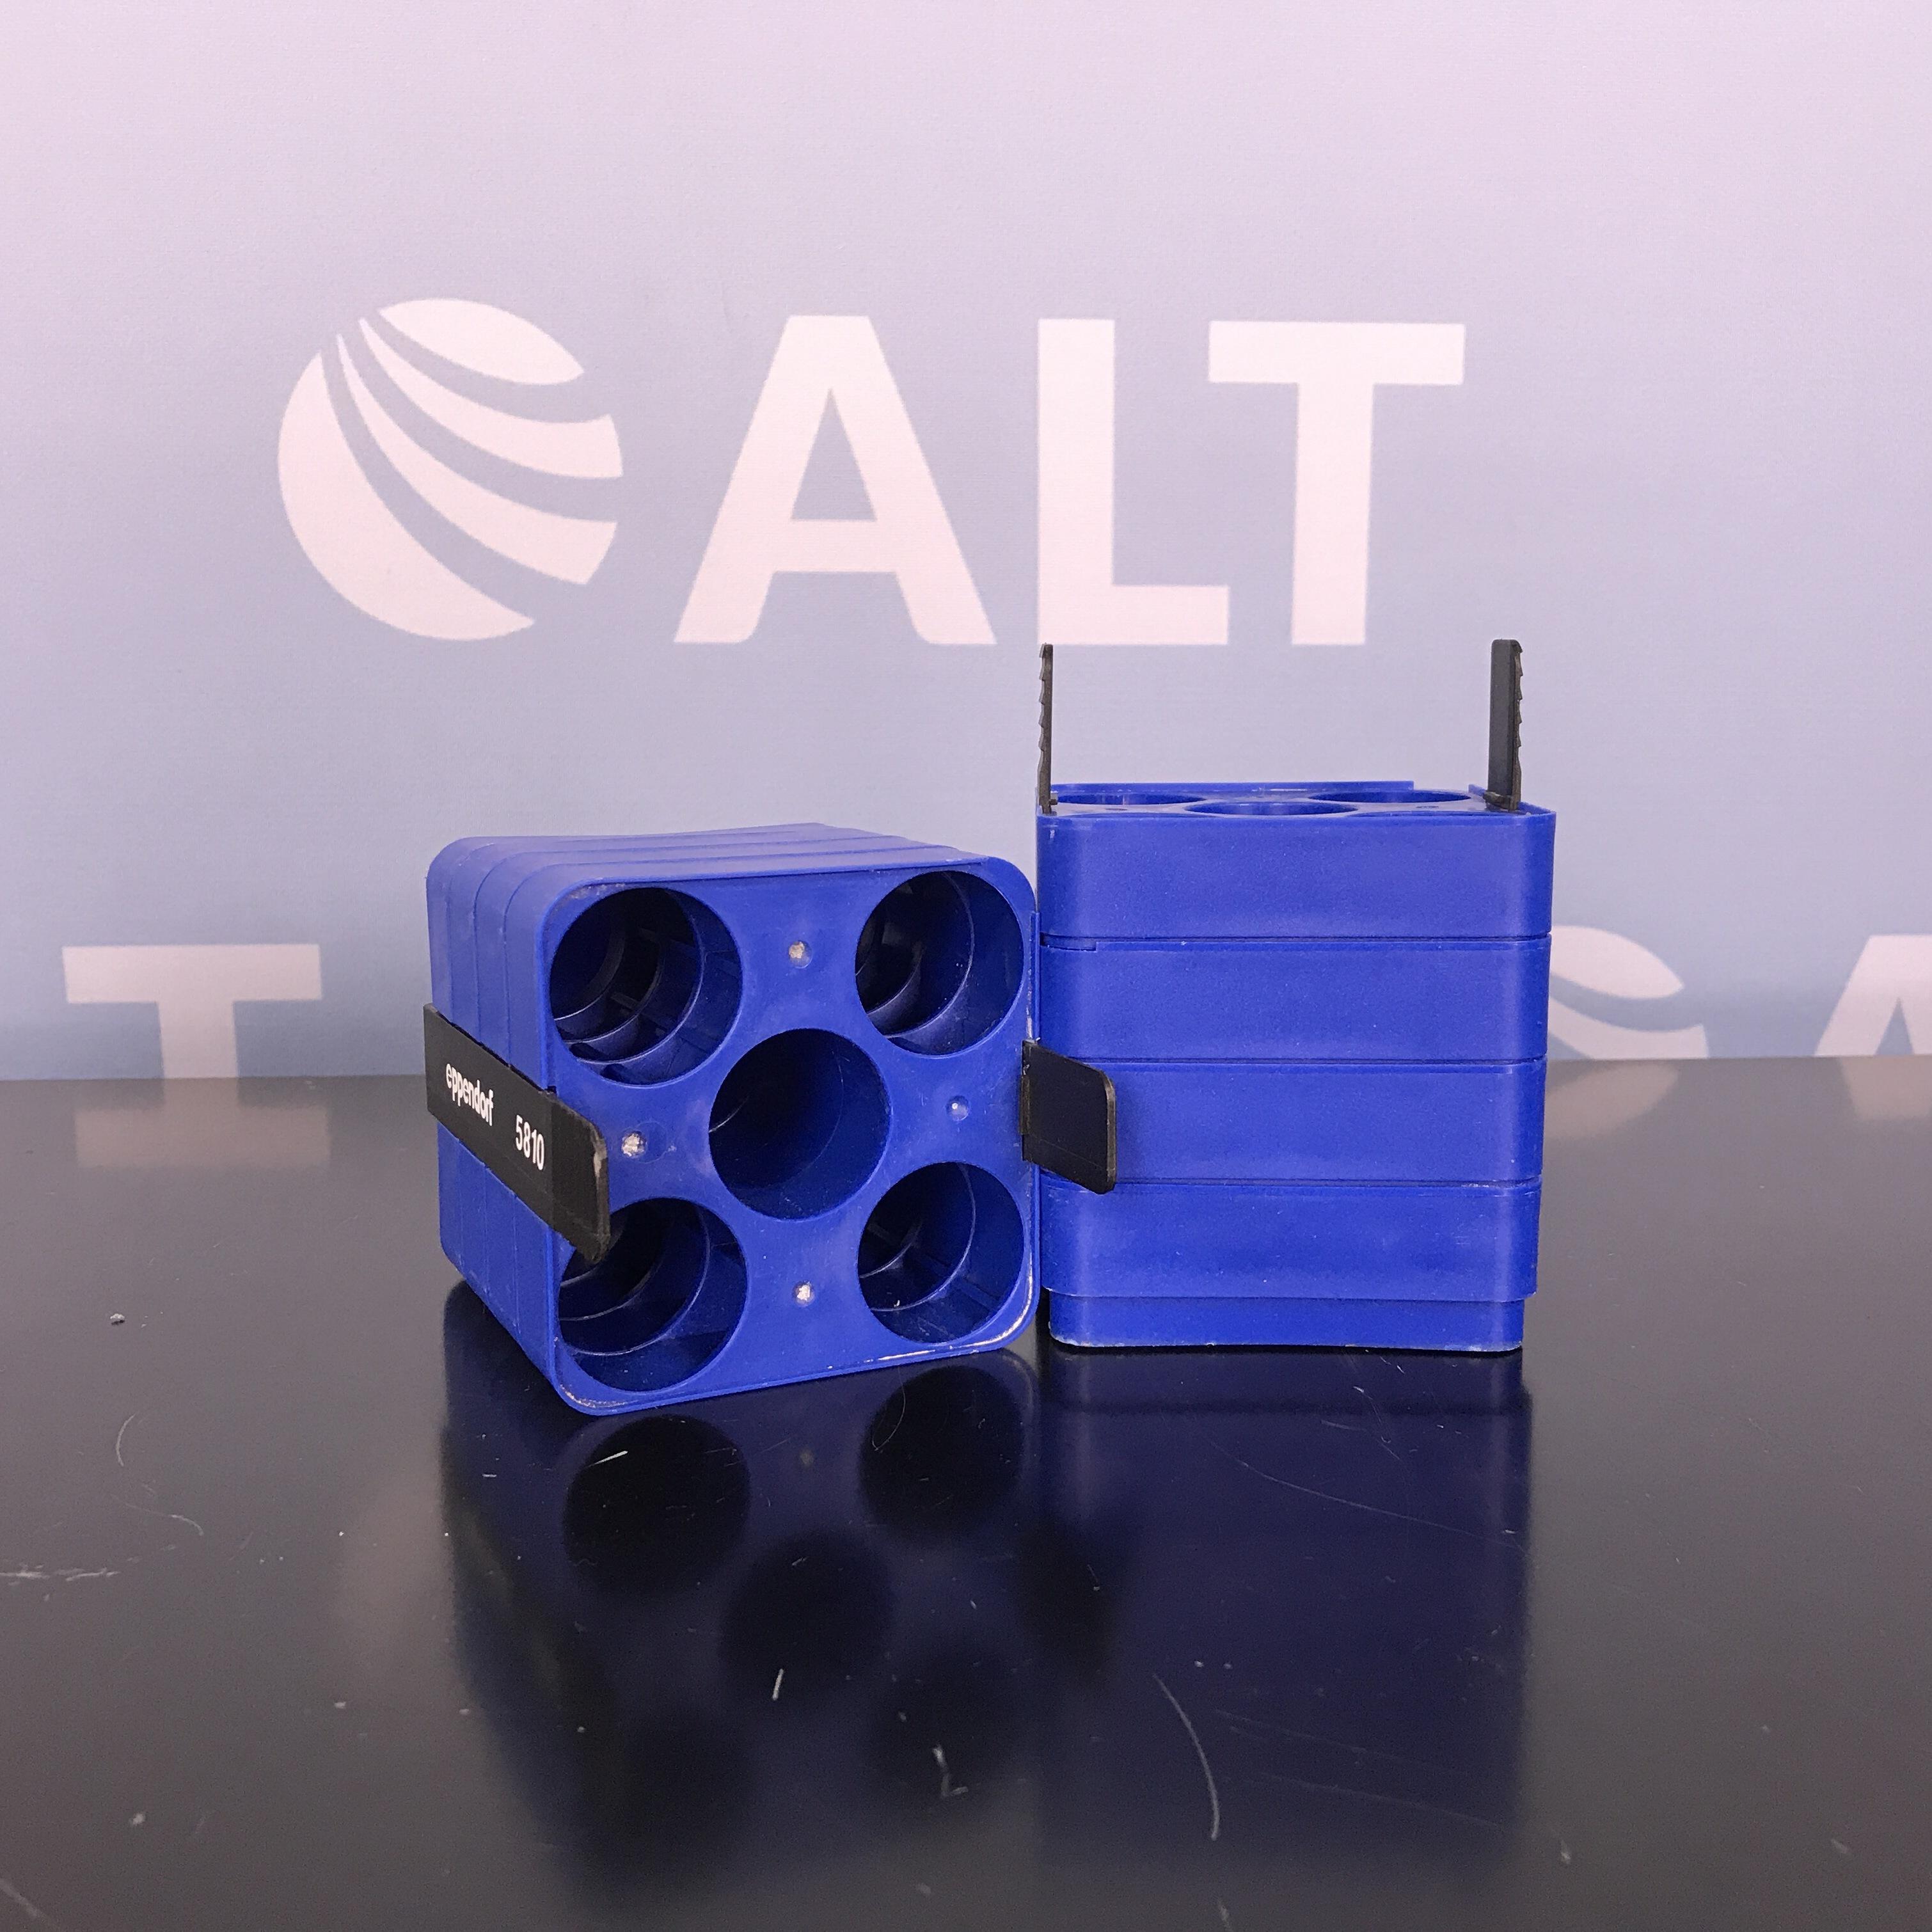 Eppendorf 5810 (5) Tube Slot Adapter for 500 mL Rectangular Bucket. 50mL: Conical Bottom (Set of 2) Image